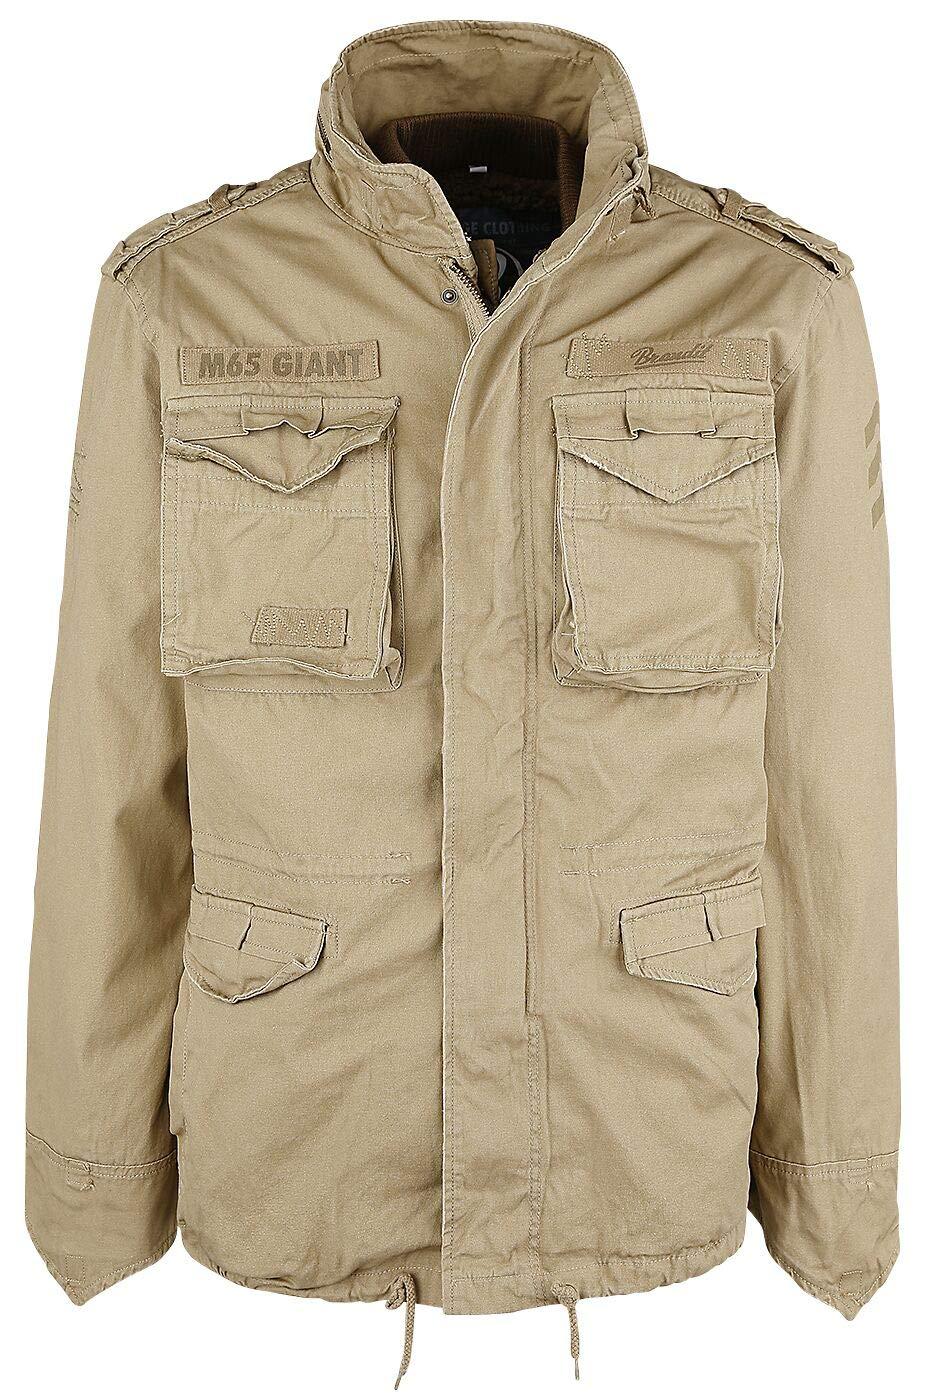 Surplus Paratrooper Winter Jacket Mens M65 Military Army Warm Coat Beige Washed